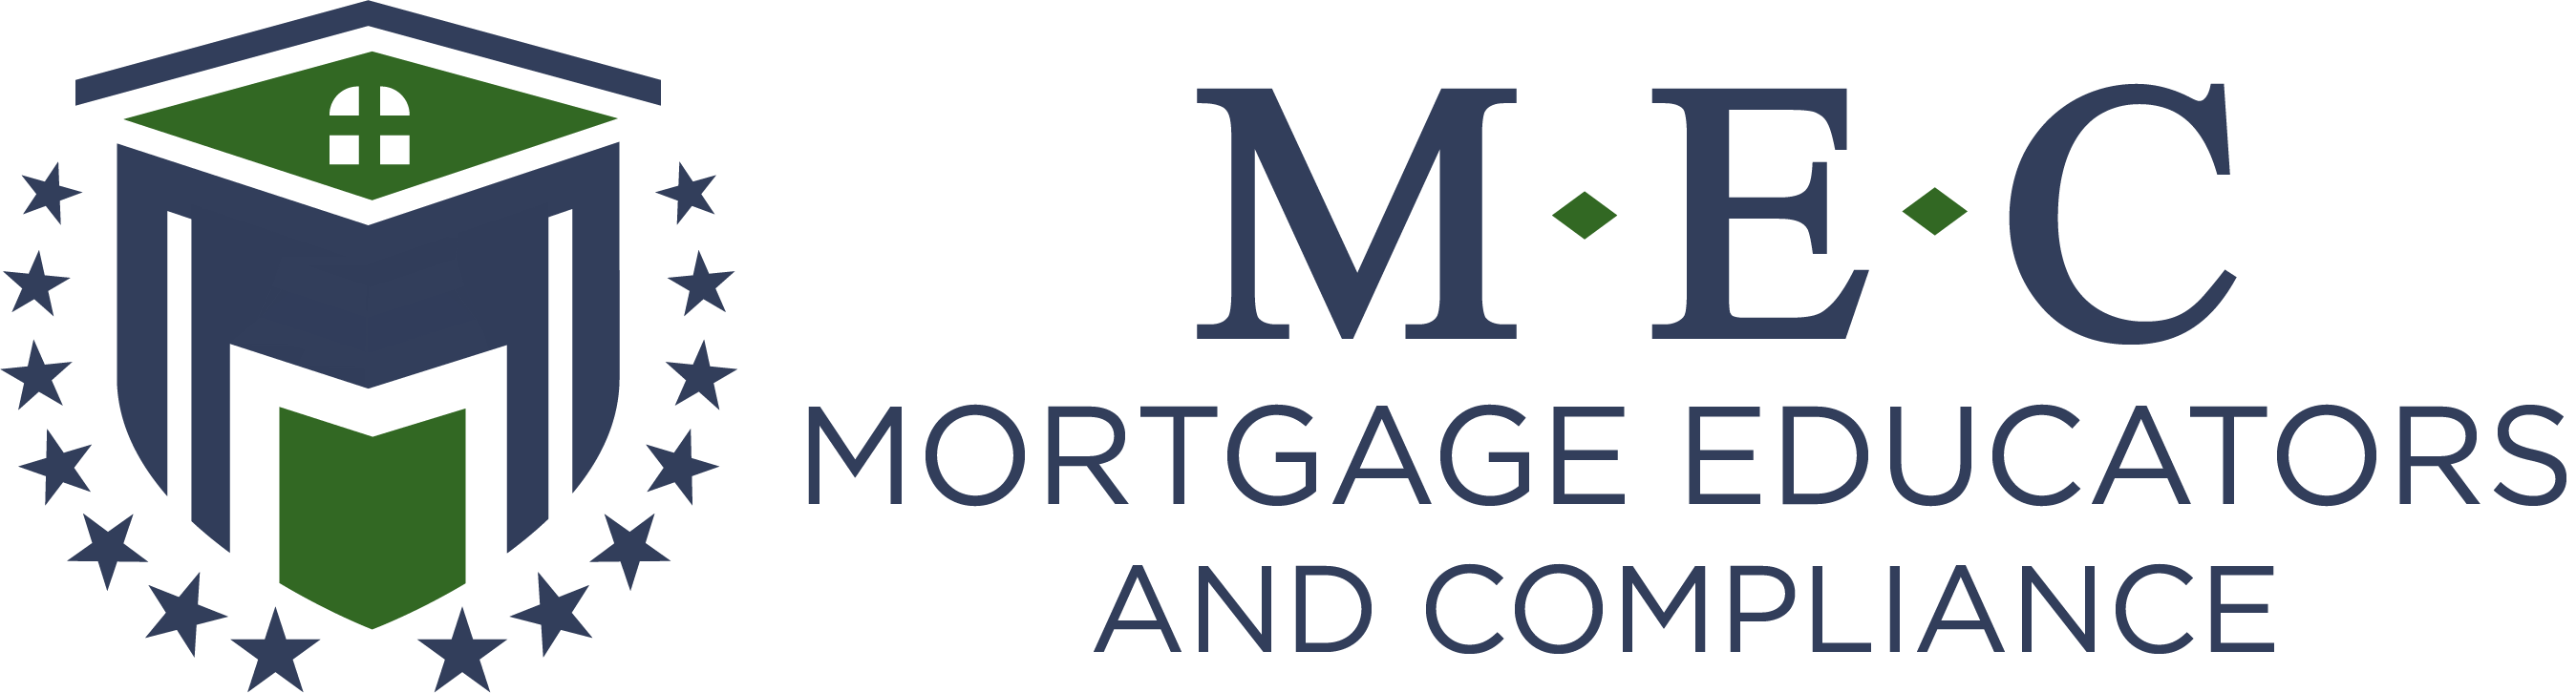 Mortgage Educators & Compliance